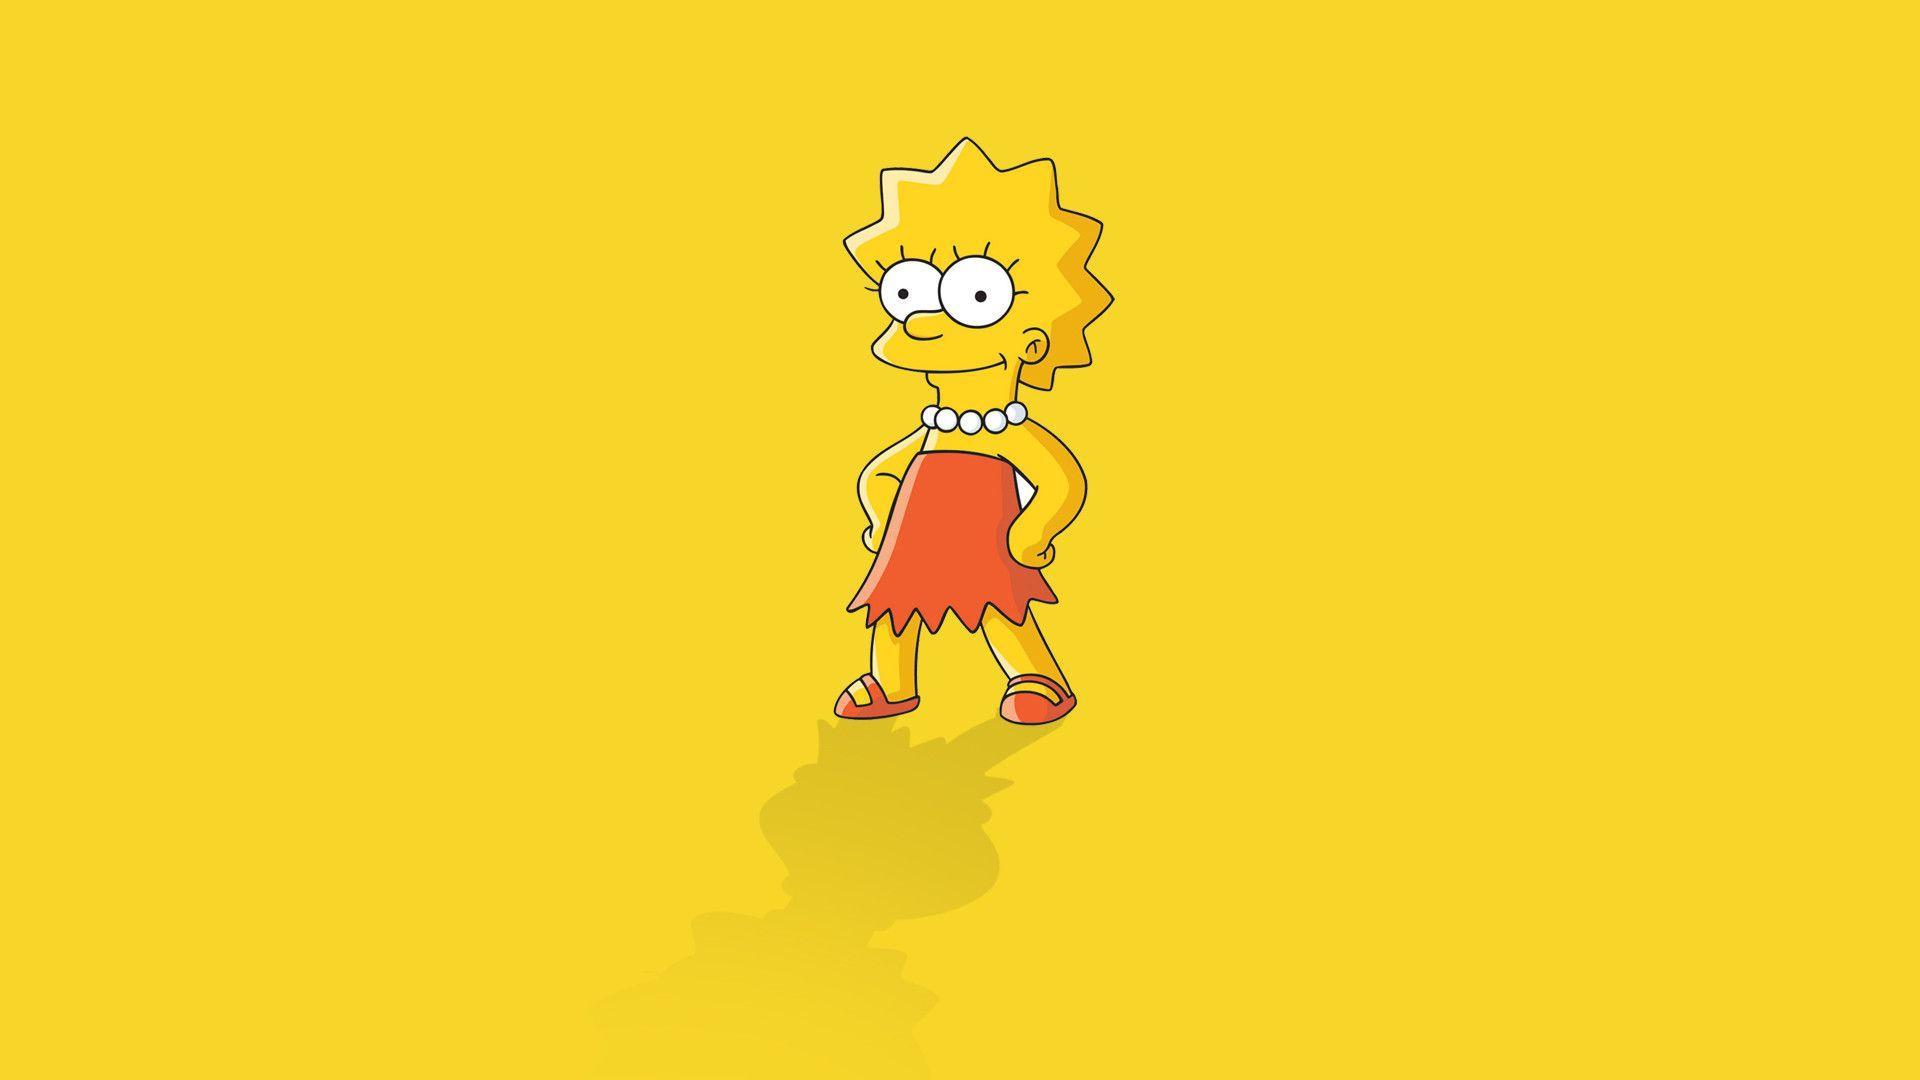 Aesthetics Simpsons Computer Wallpapers Top Free